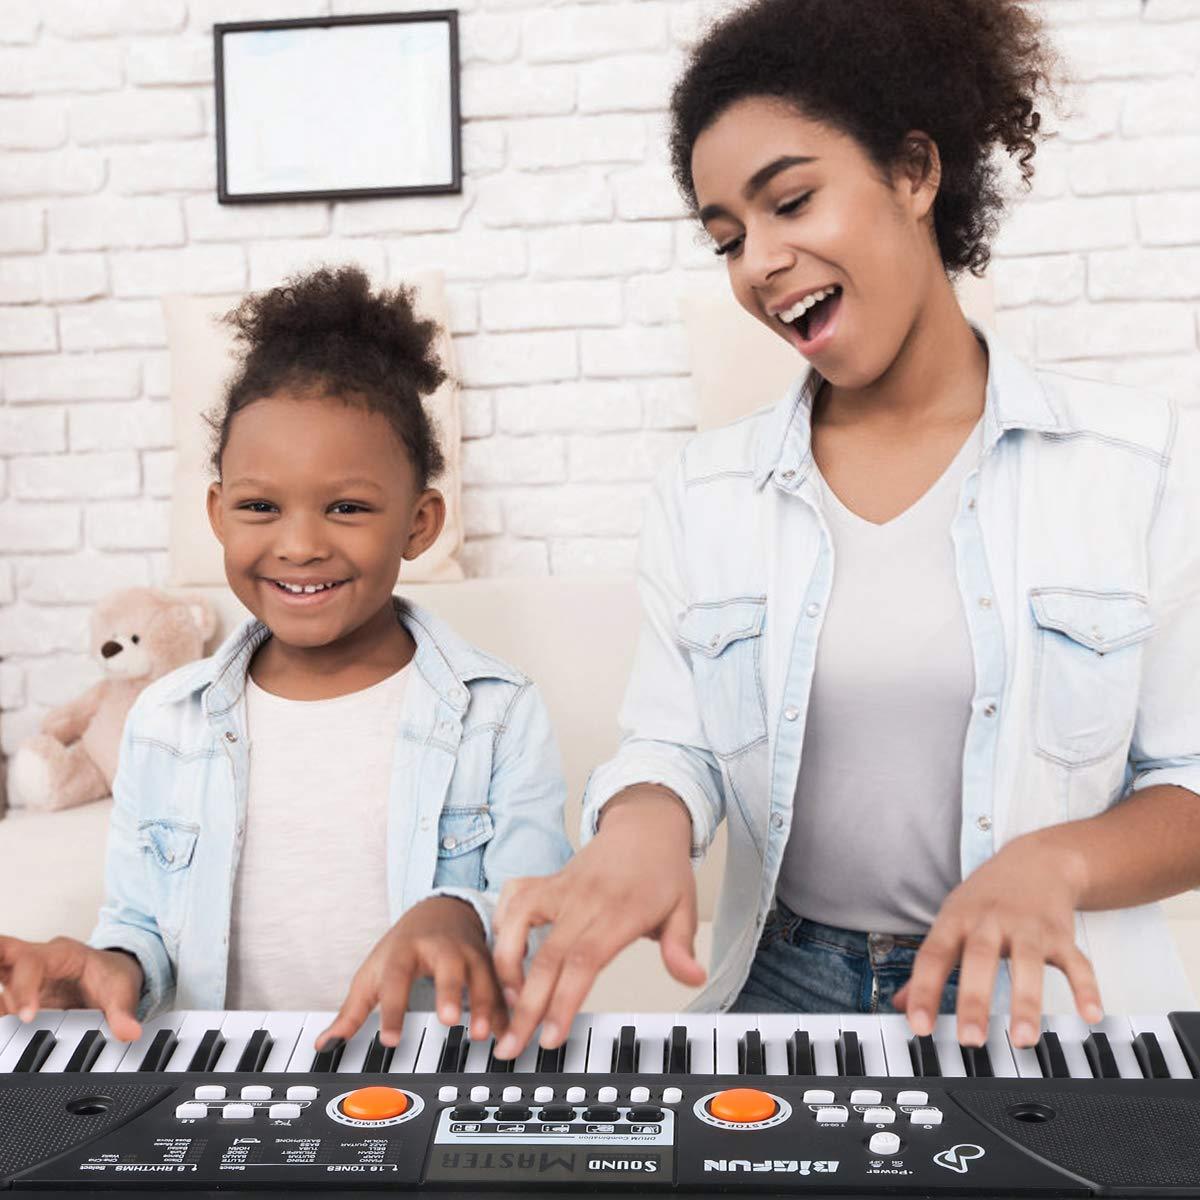 RenFox 49 Key Piano Keyboard Portable Electronic Kids Piano Keyboard Beginner Digital Music Piano Keyboard & Microphone Teaching Toy Gift for Kids Boy Girl by RenFox (Image #7)